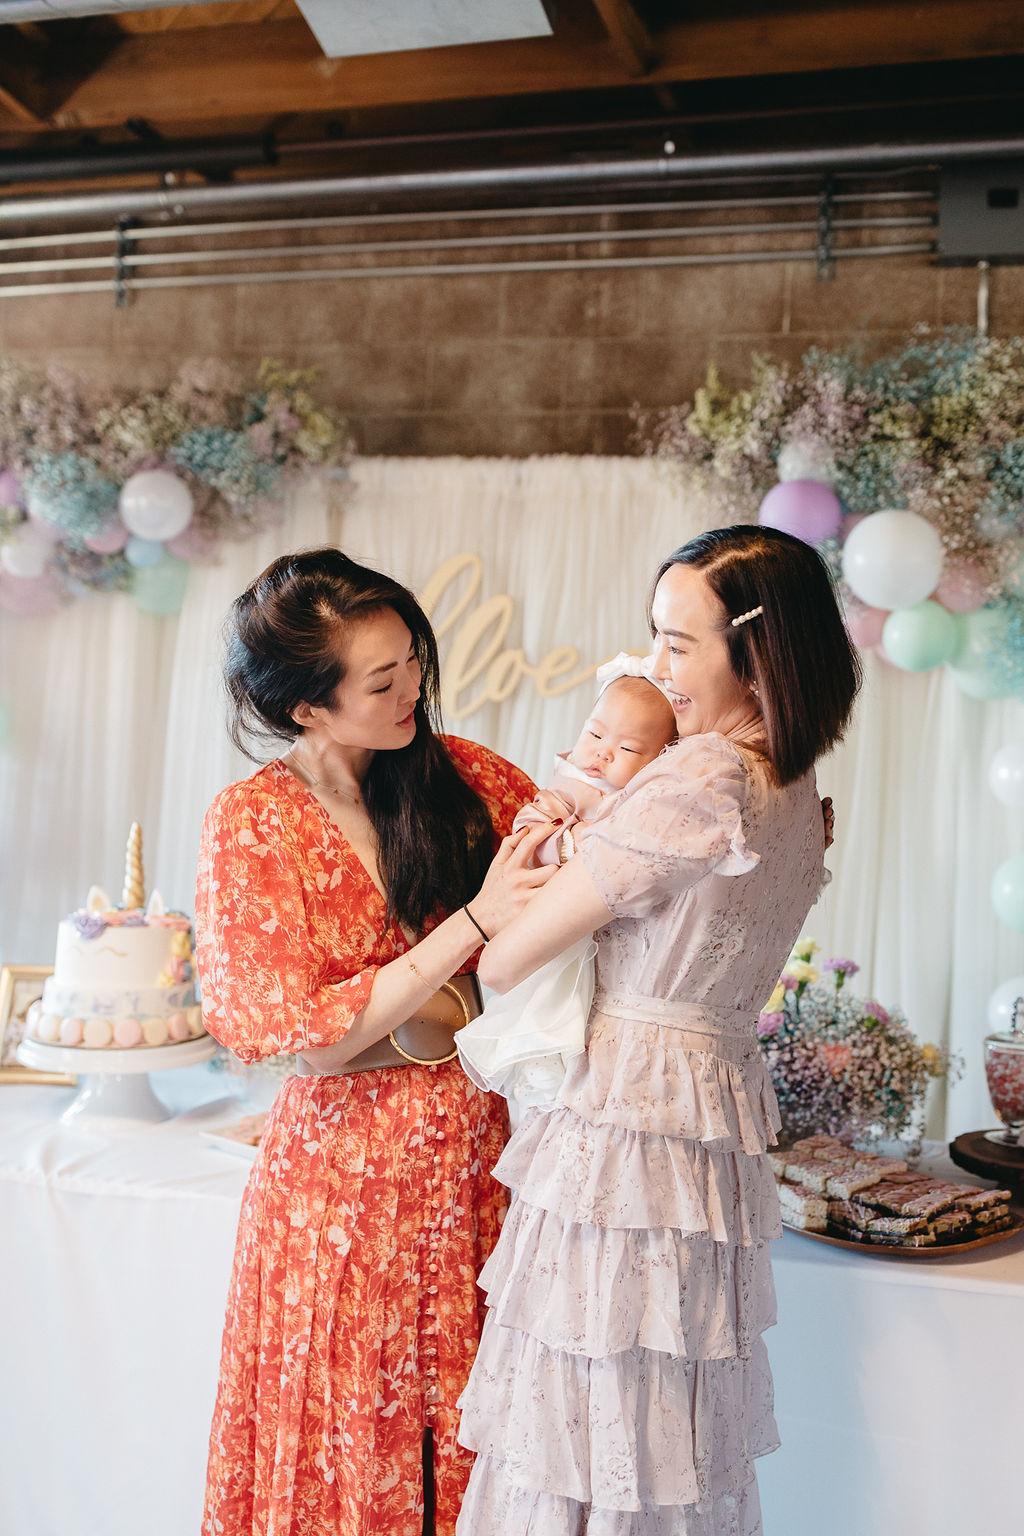 15 Colette Chloe Chriselle Lim Unicorn Girls Party OC LA Lifestyle Event Photographer Joy Theory Co